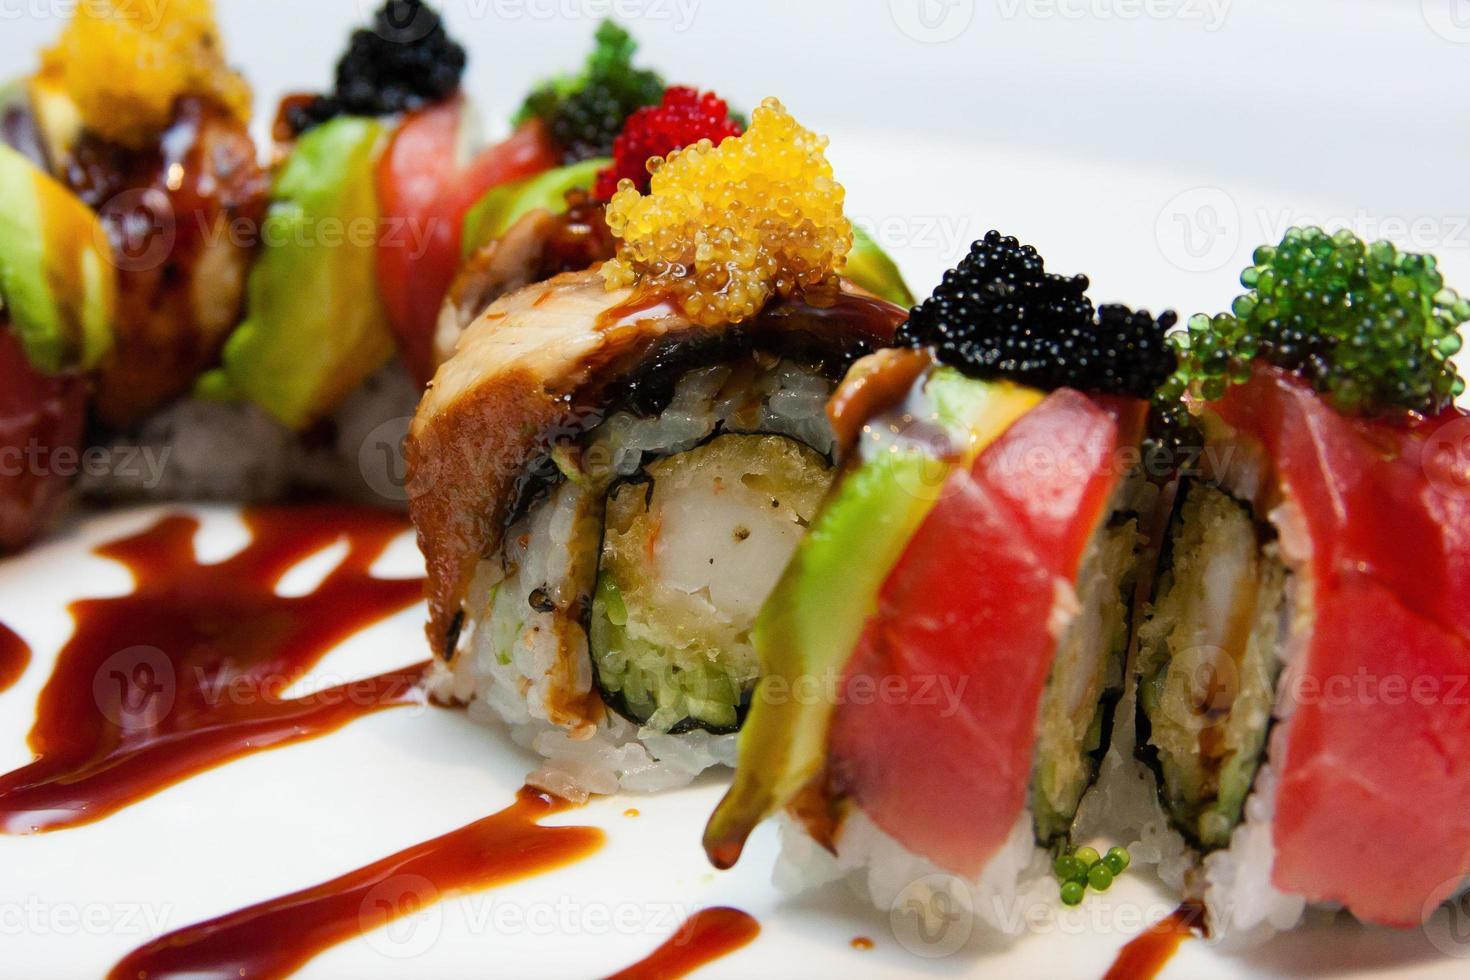 rollo de sushi de cerca foto